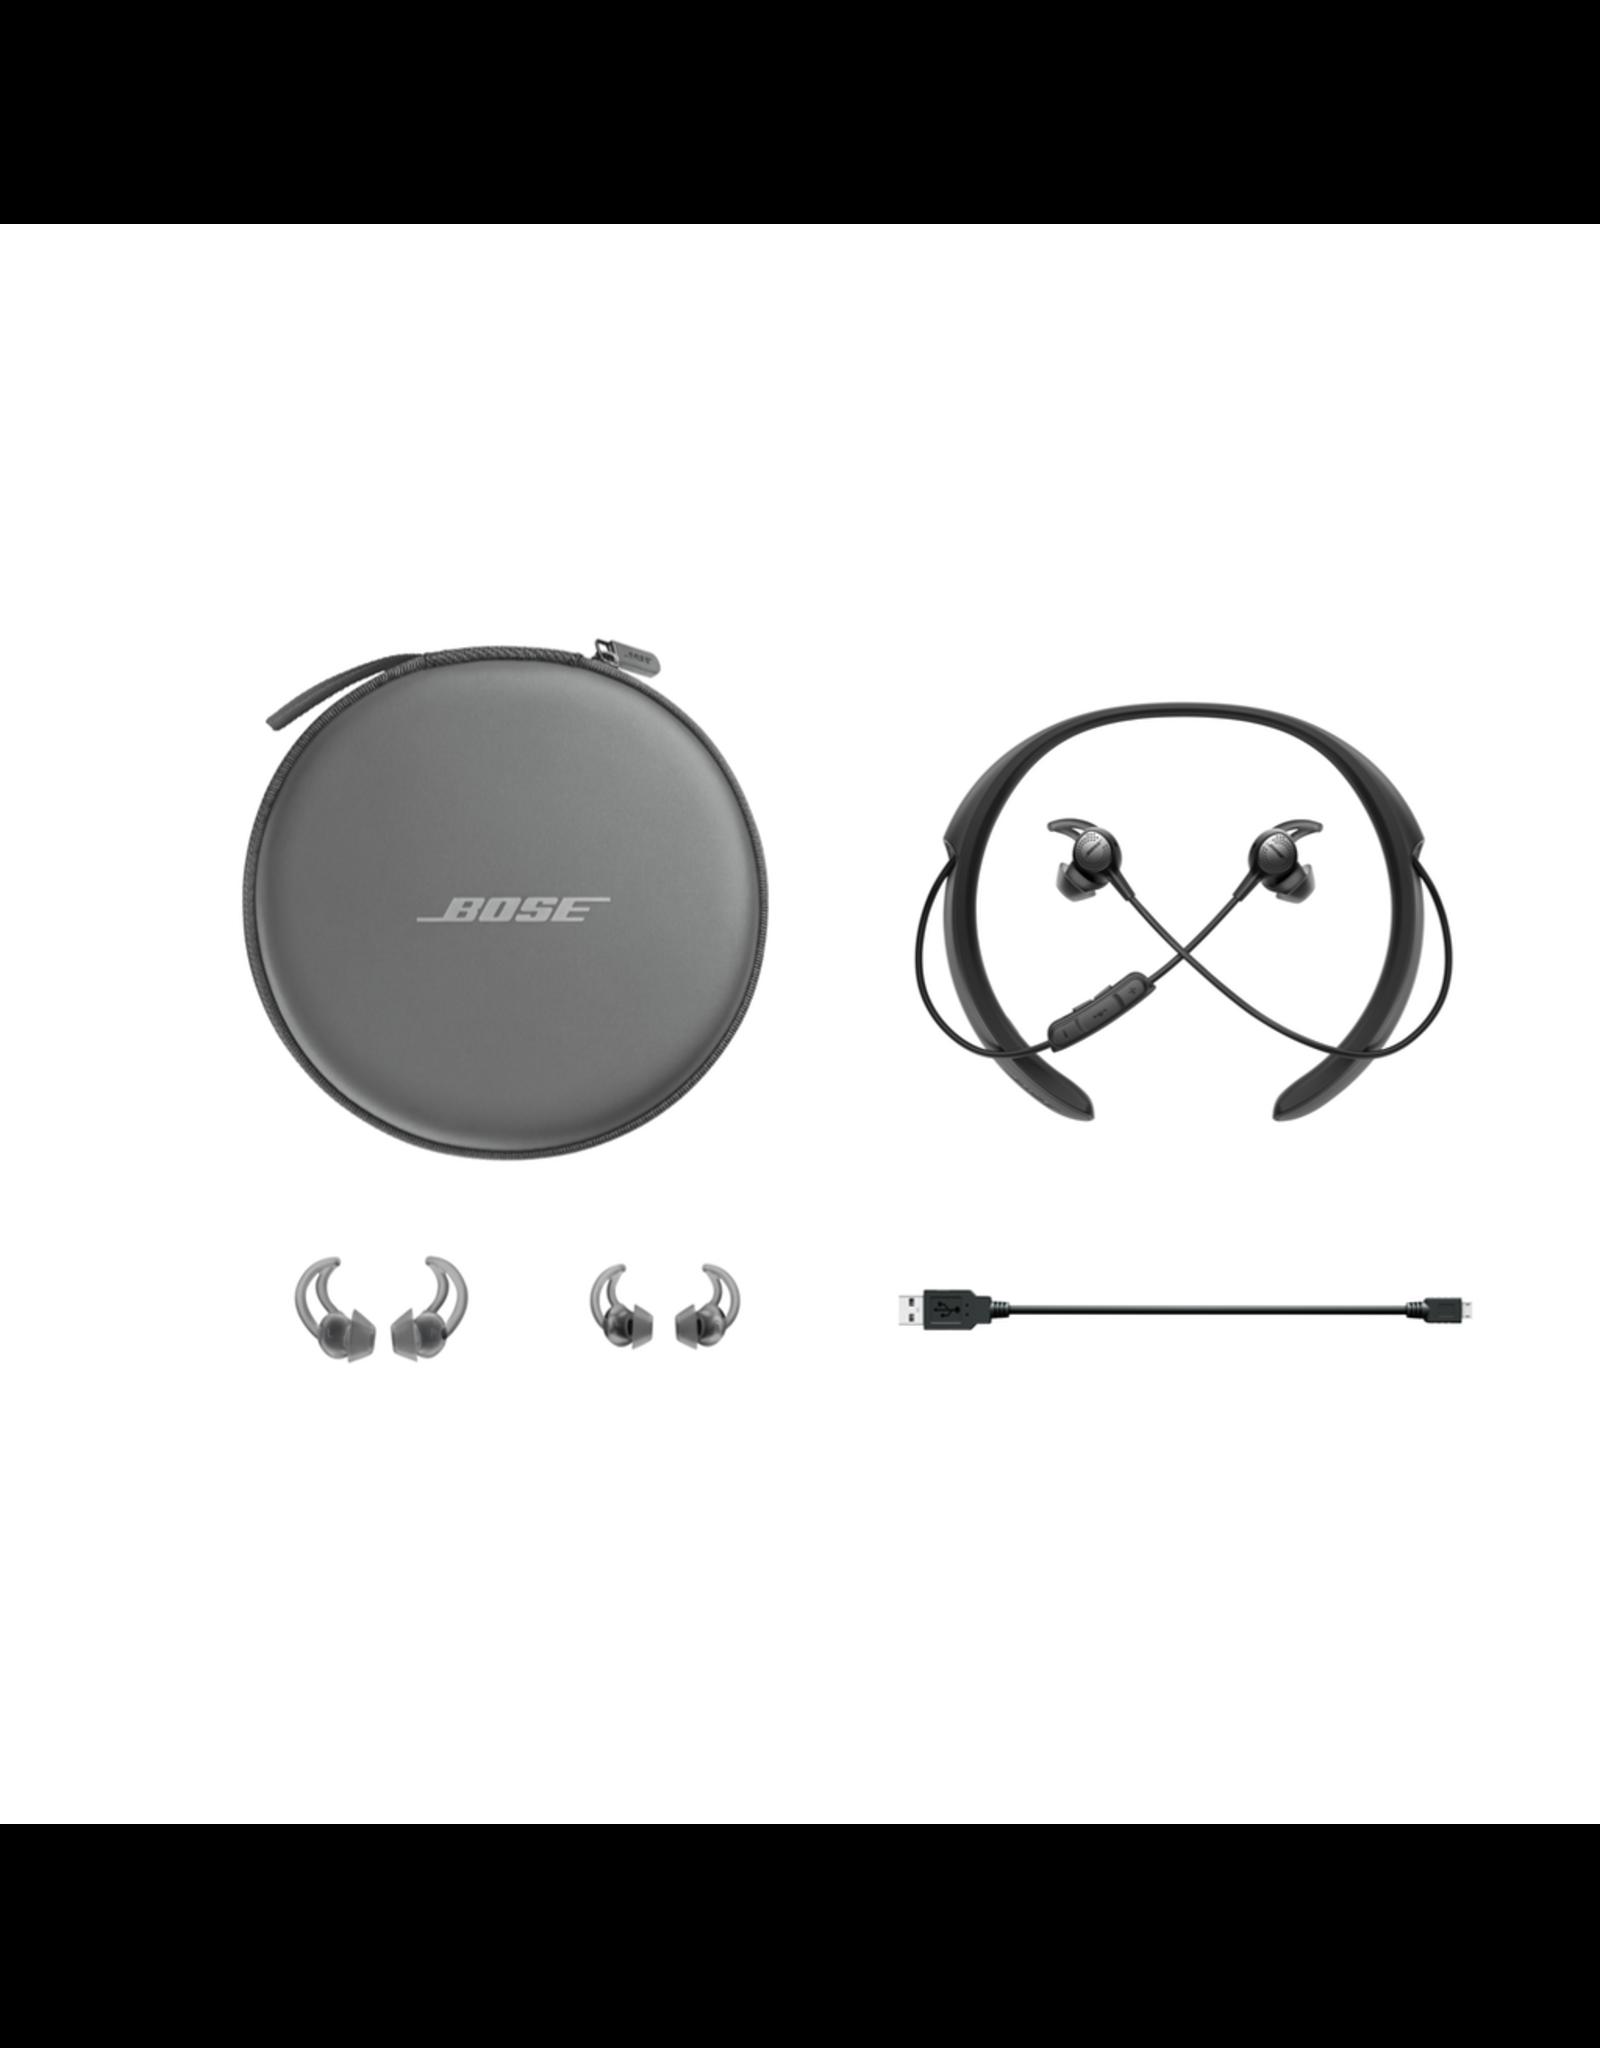 BOSE BOSE QC30 Wireless In-Ear Noise Cancelling Headphones BLACK